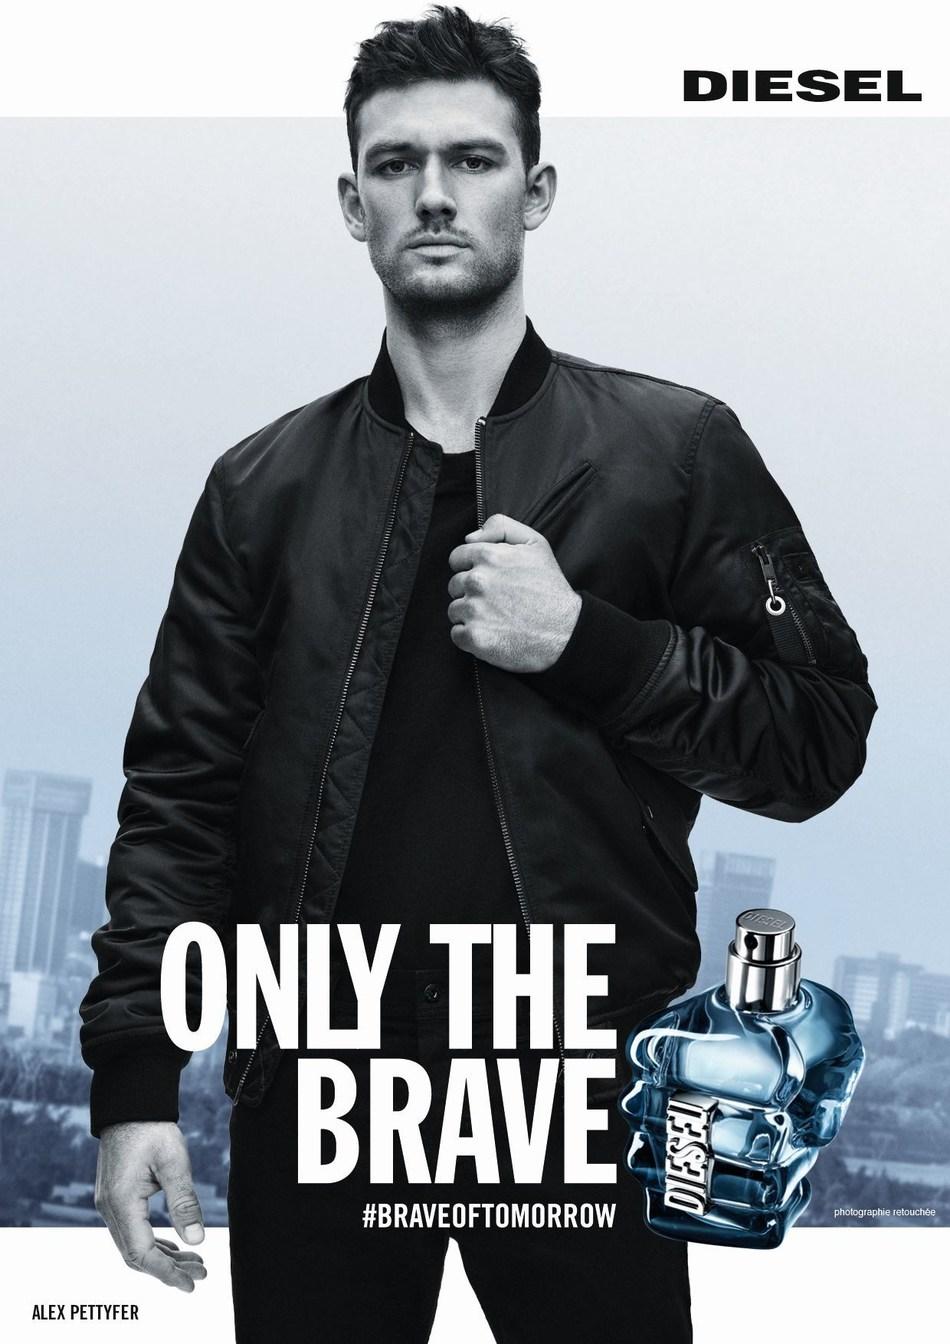 Diesel Only The Brave Fragrance New Campaign, Redefining Bravery (PRNewsfoto/Diesel Fragrances)